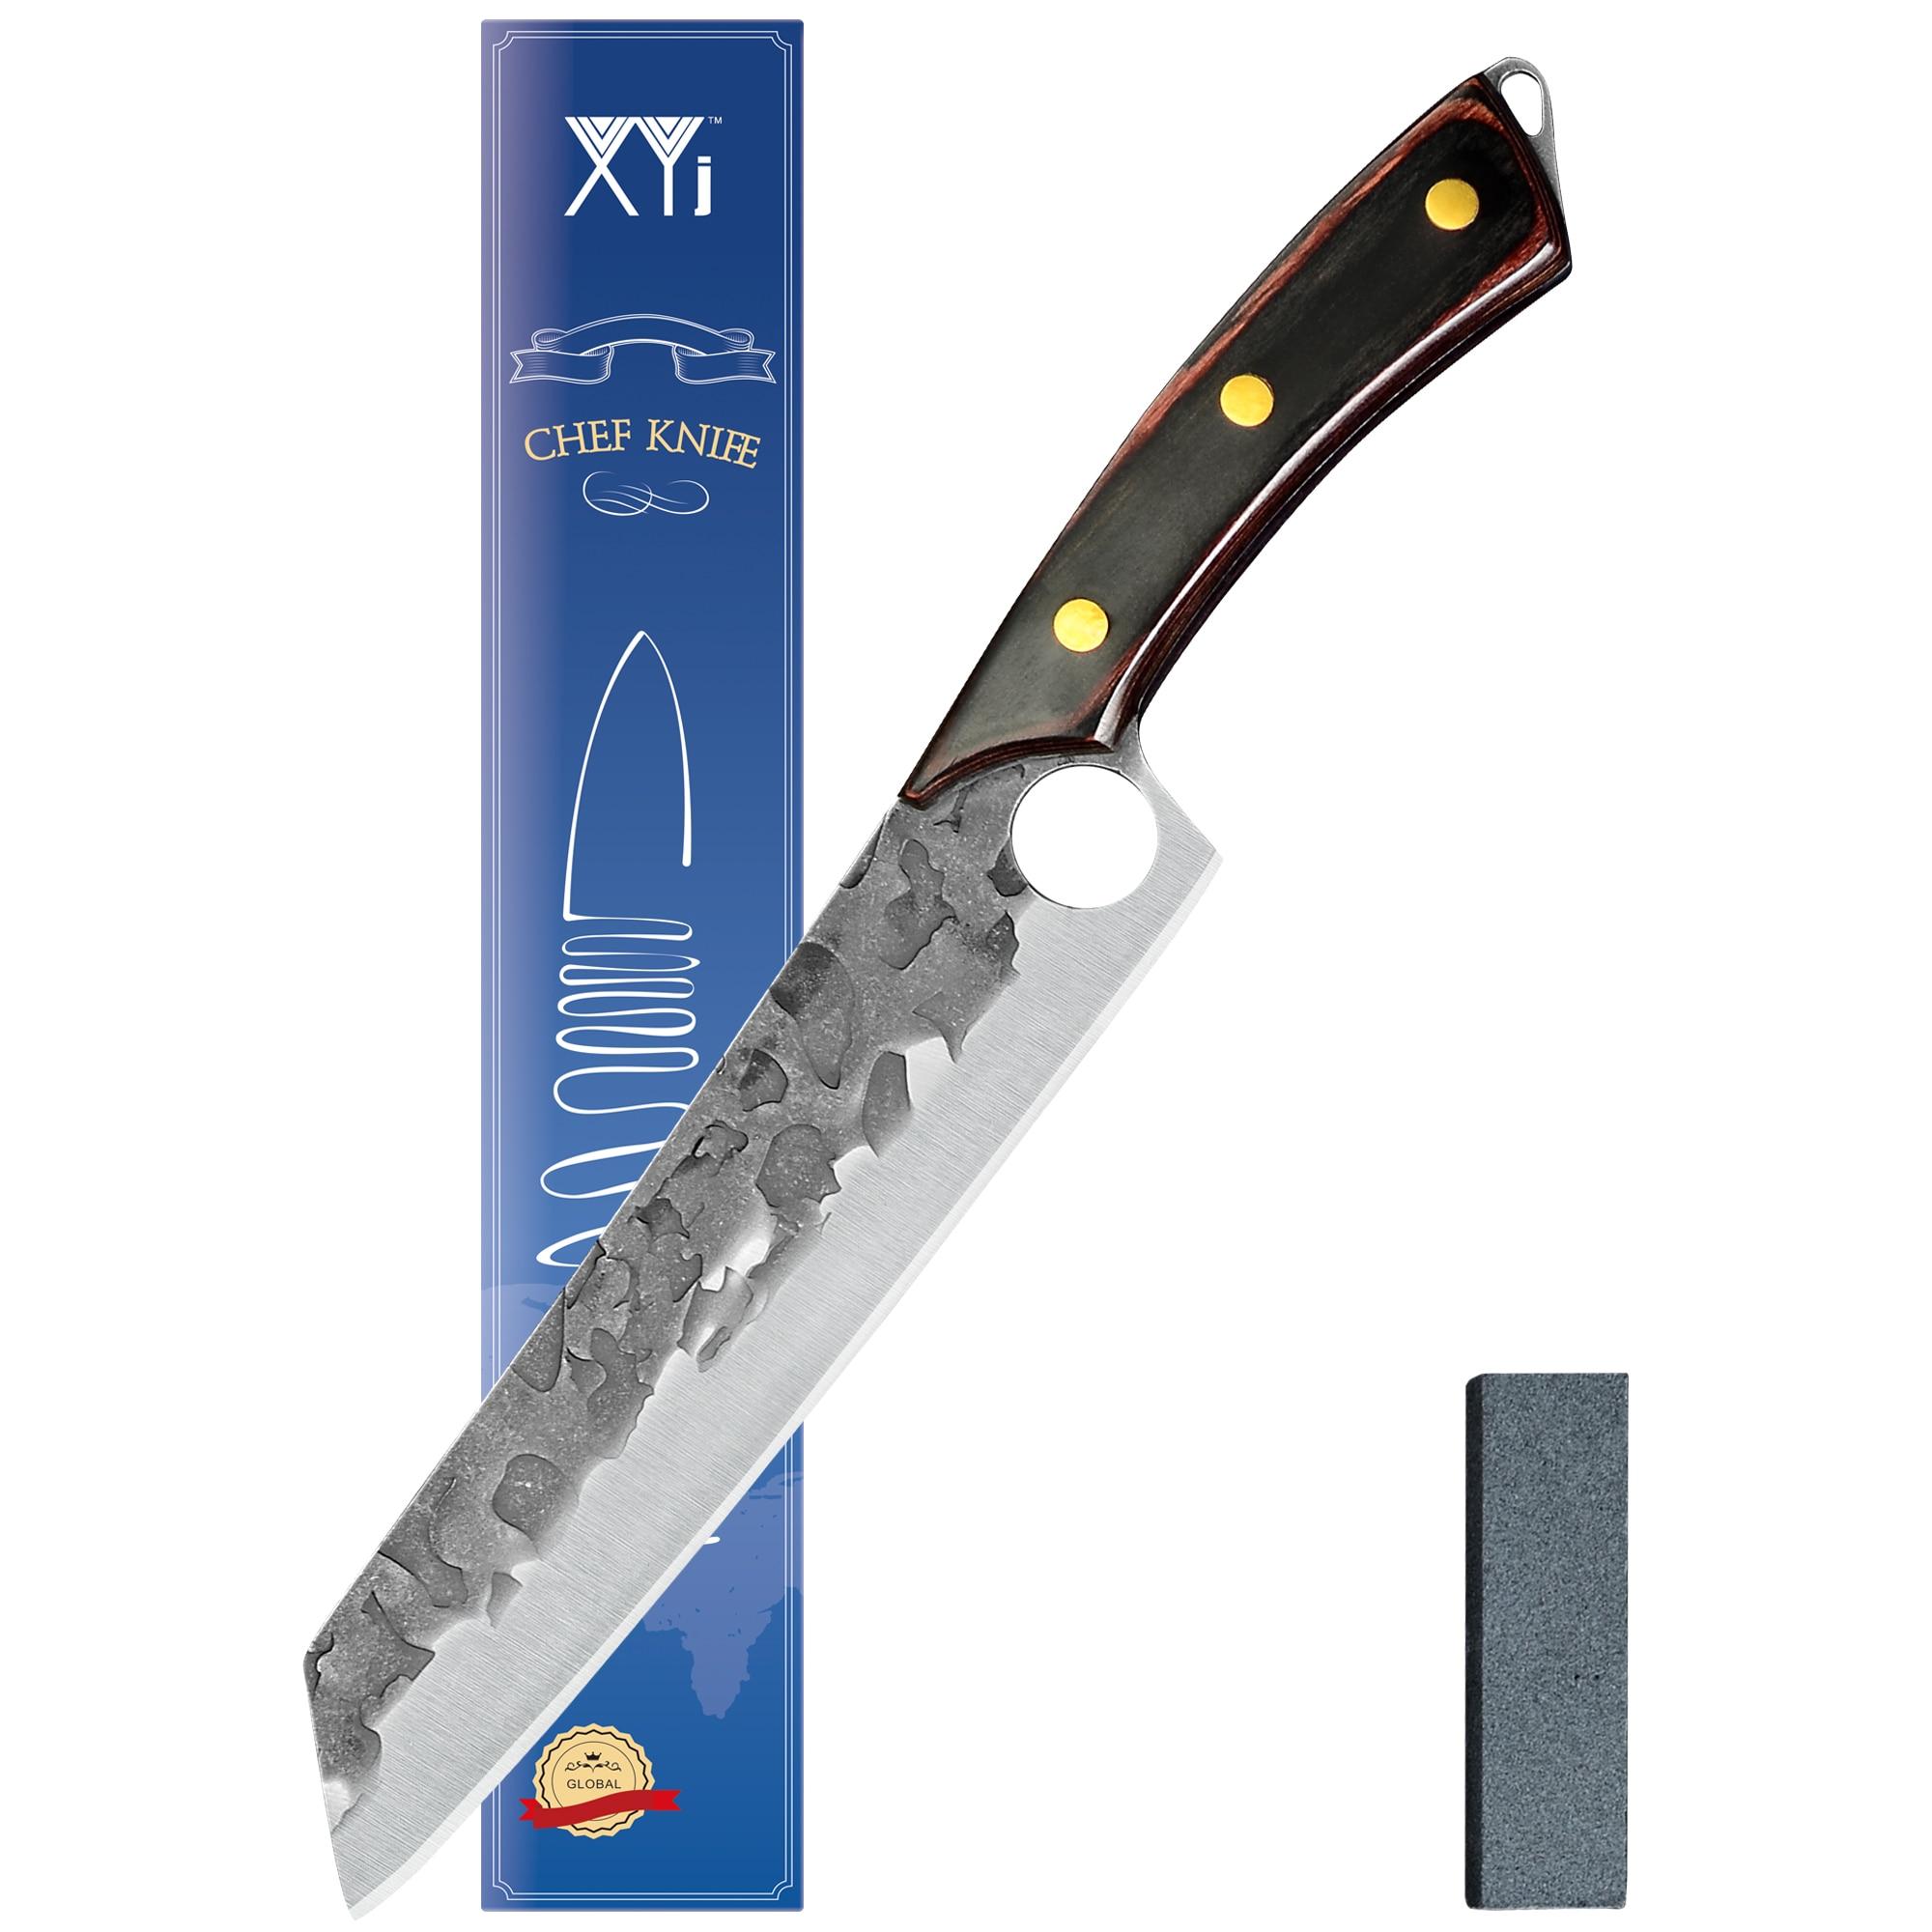 XYJ 8.5 بوصة كامل تانغ فيليه سكين المشحذ المطرقة إنهاء شفرة مقبض خشبي اللحوم الساطور الأسماك آلة تقطيع اللحوم السكاكين في صندوق هدية